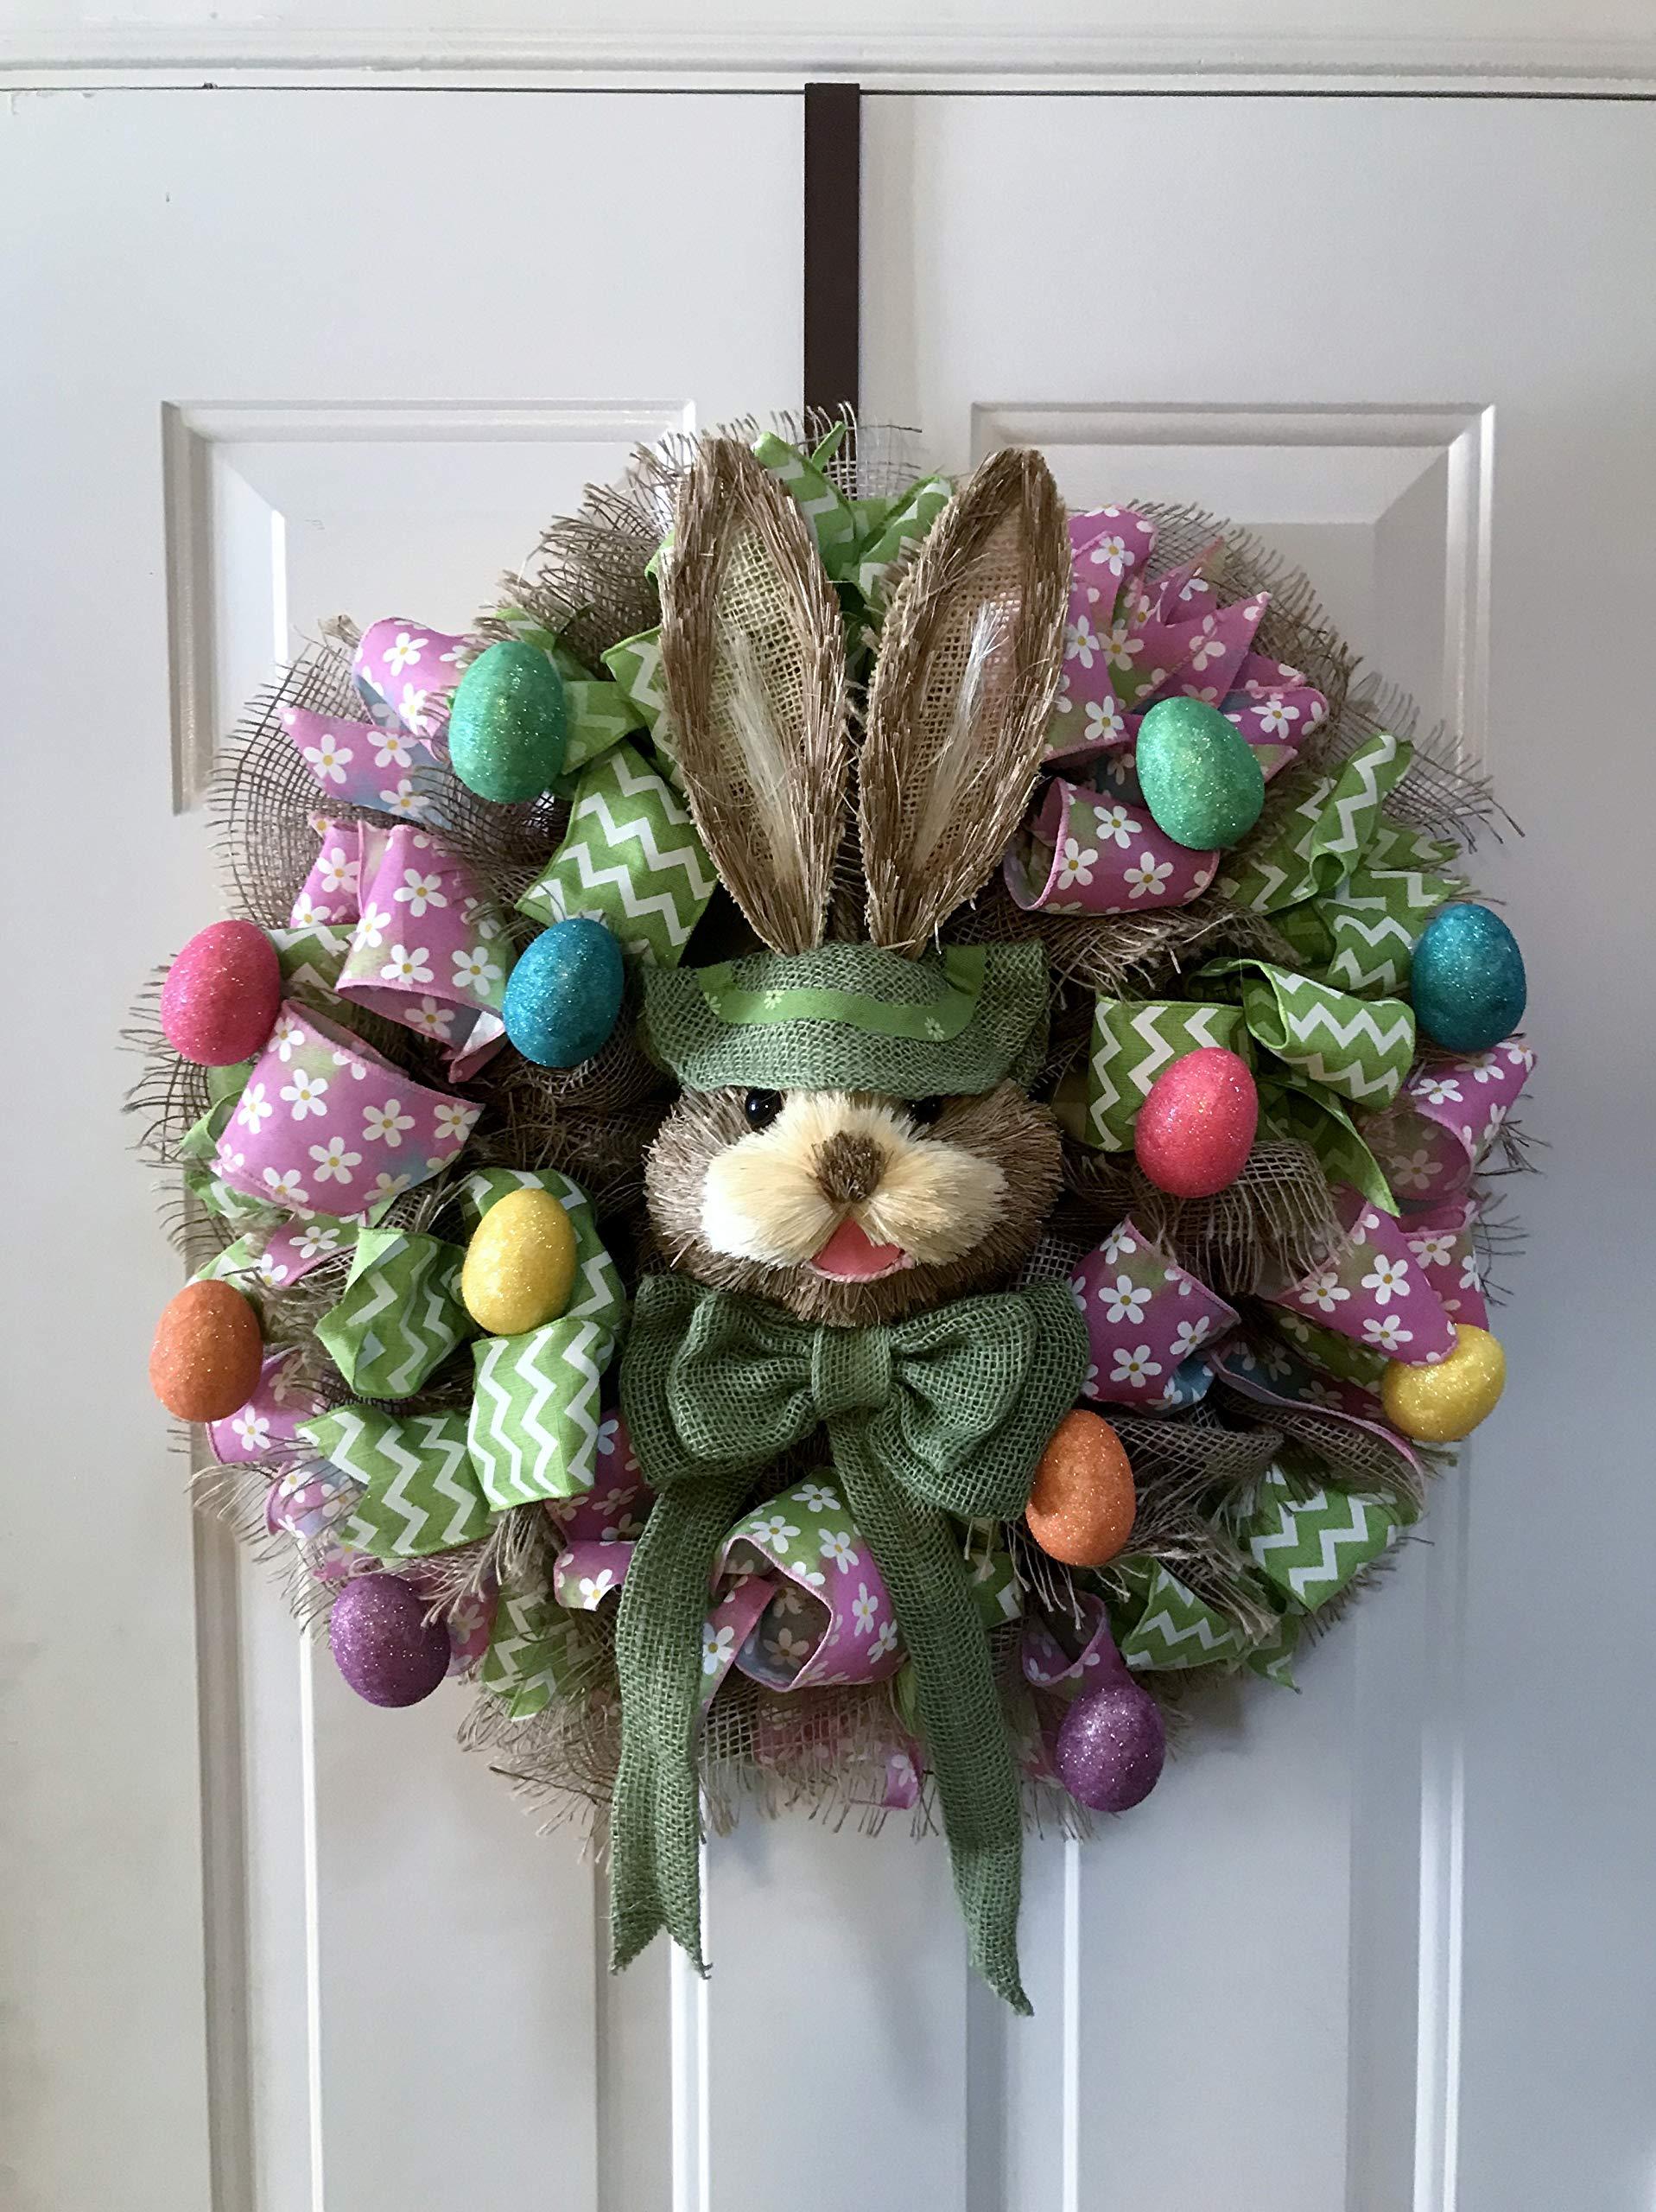 MarDav4Life Easter Wreath (Green Bunny) Door Decor - Happy Spring!!!